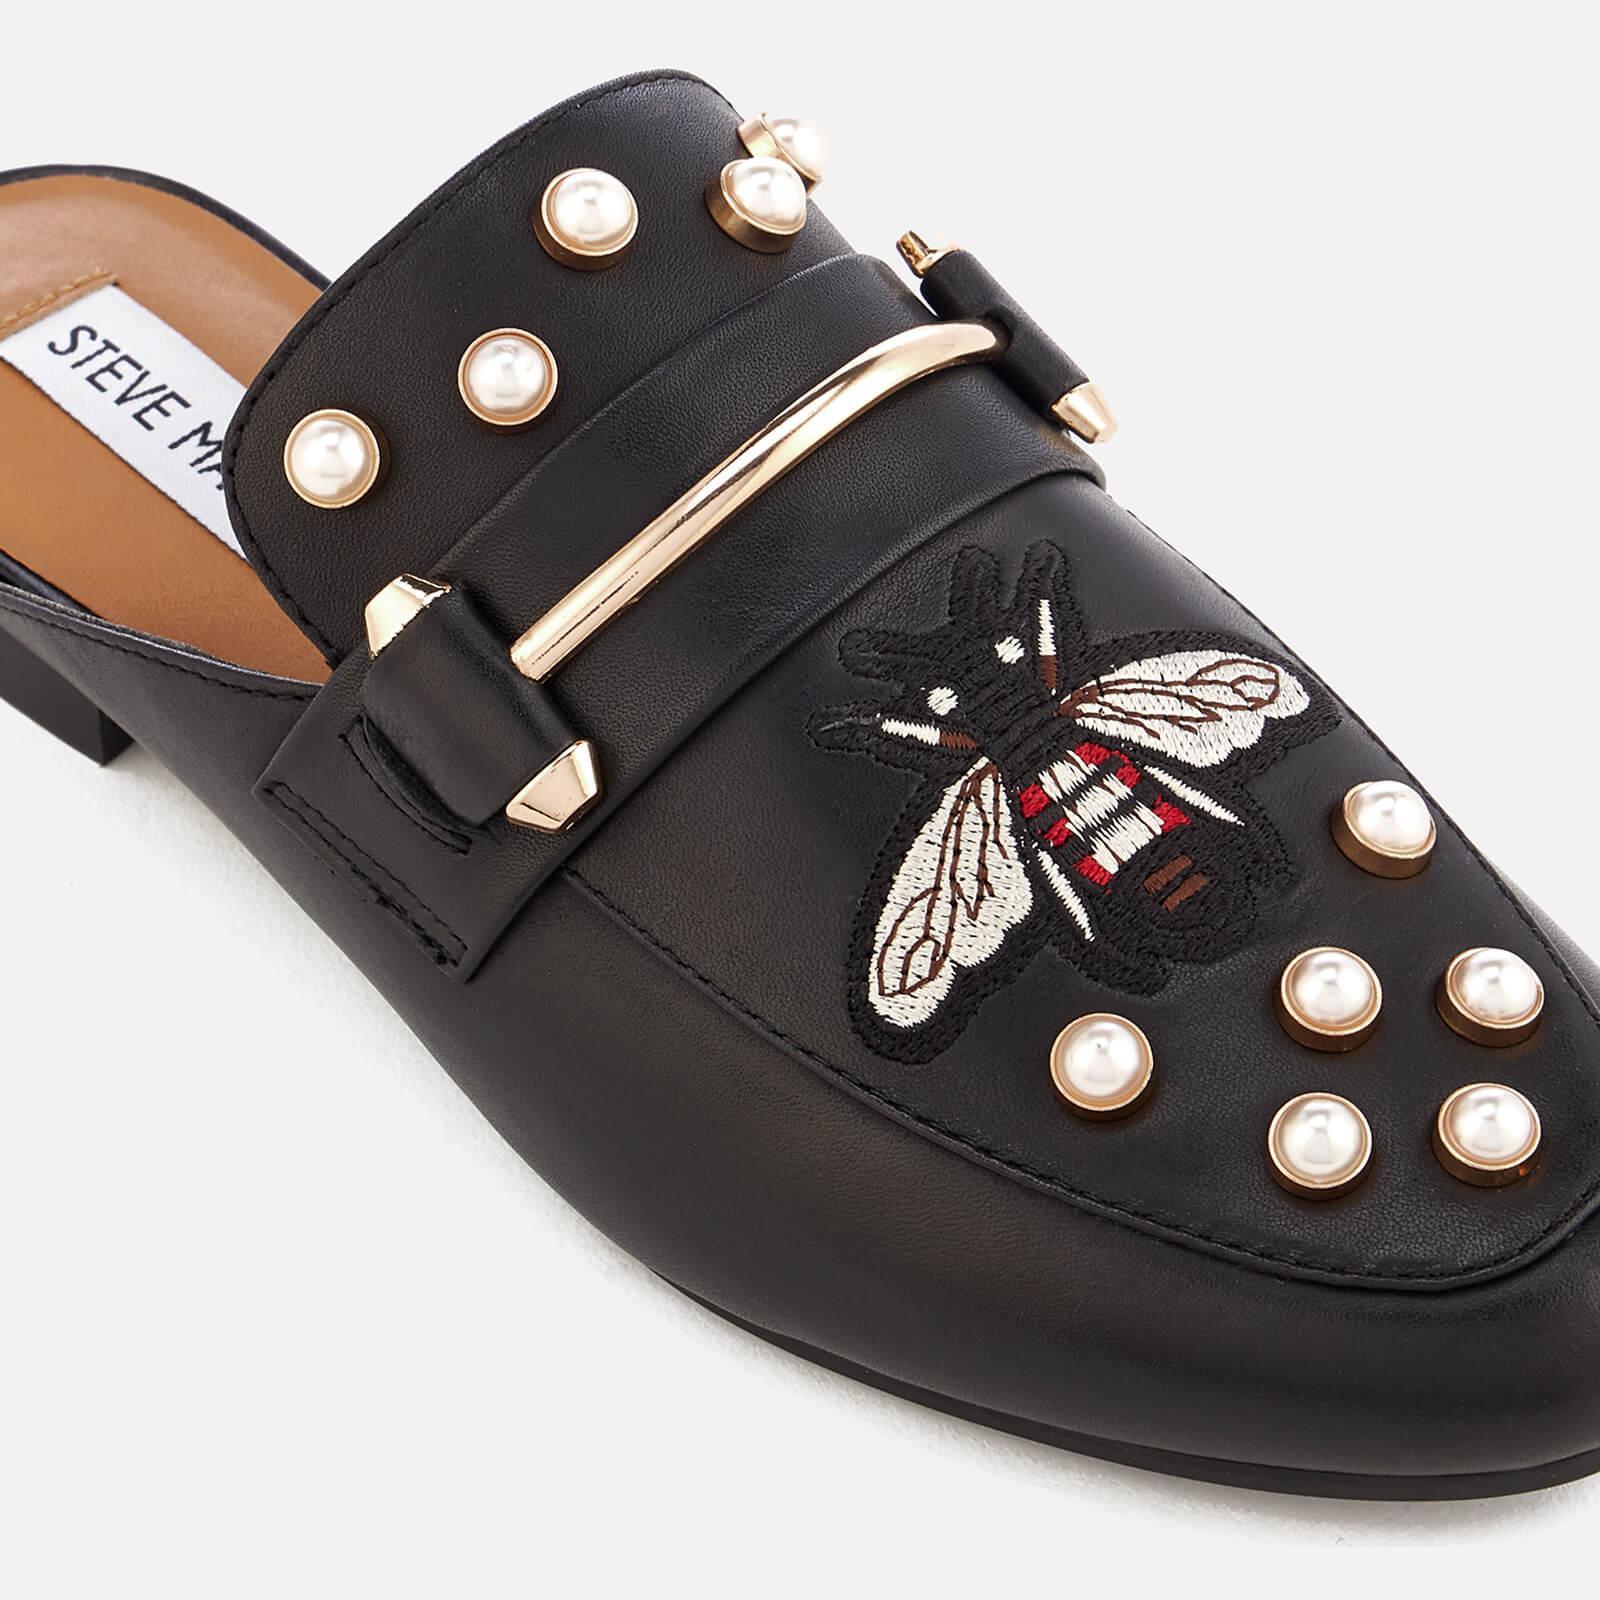 b105ec7c51e Steve Madden Black Kera-b Leather Slide Loafers